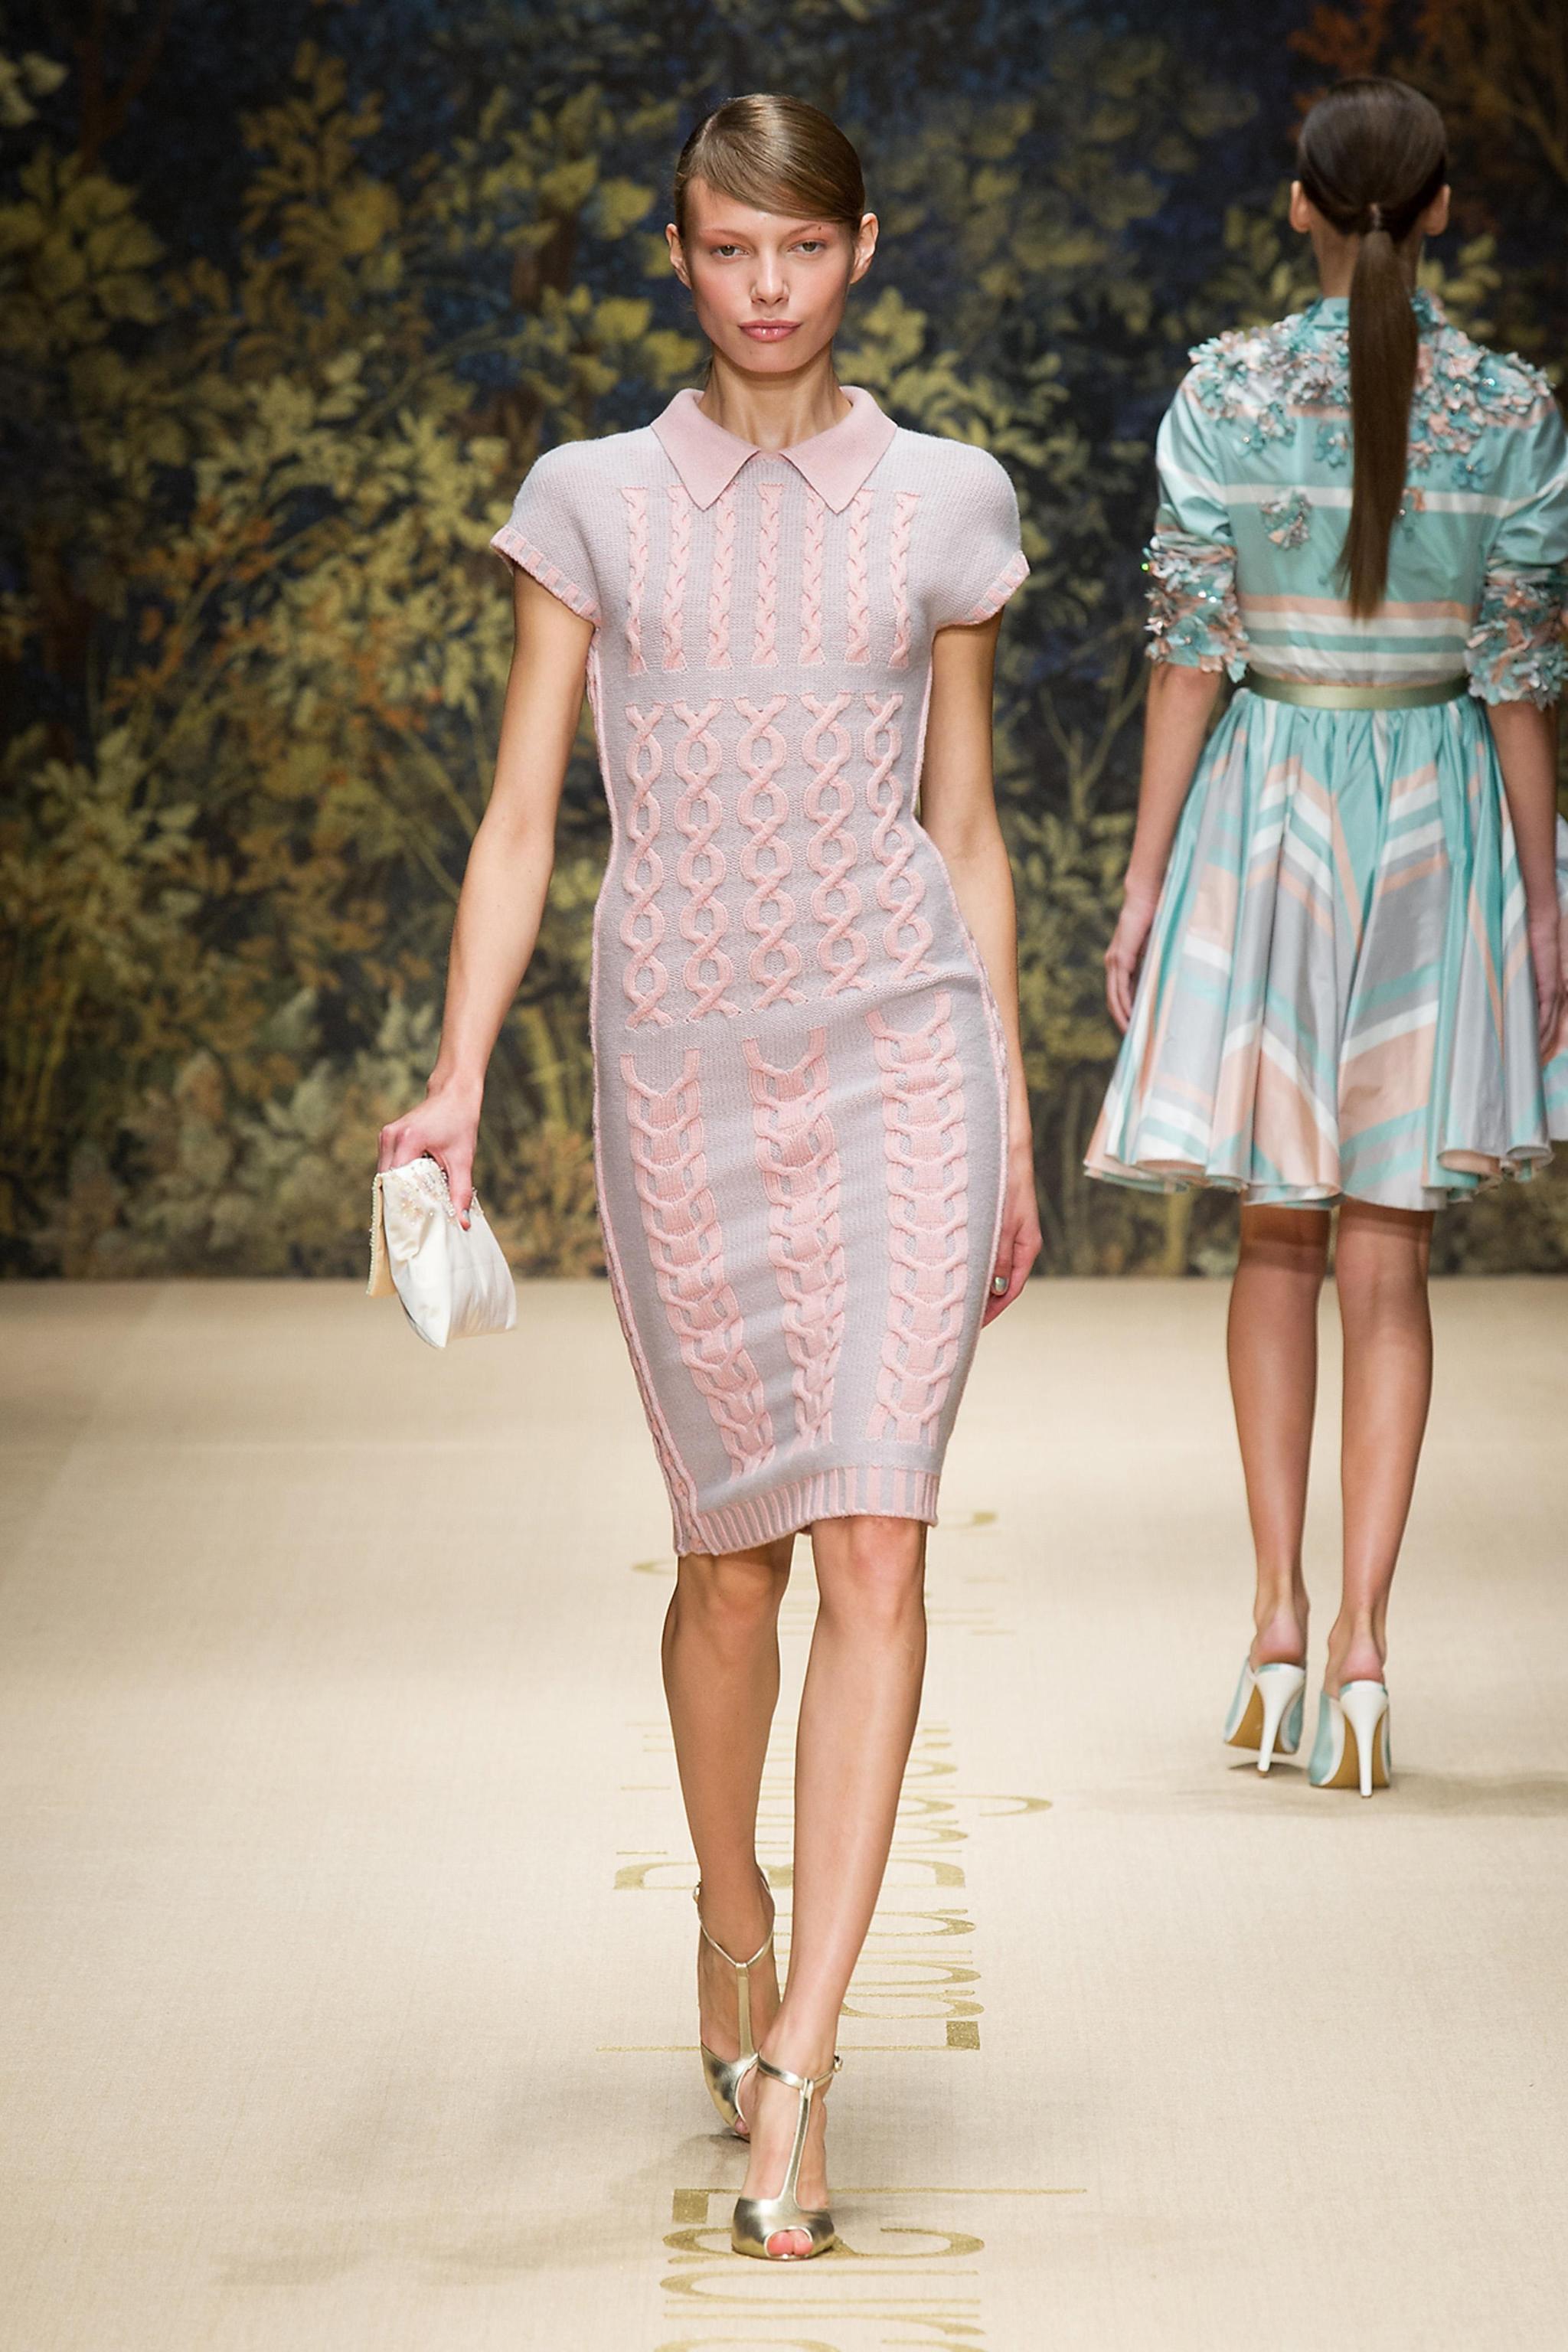 Milan Fashion Week: Laura Biagiotti